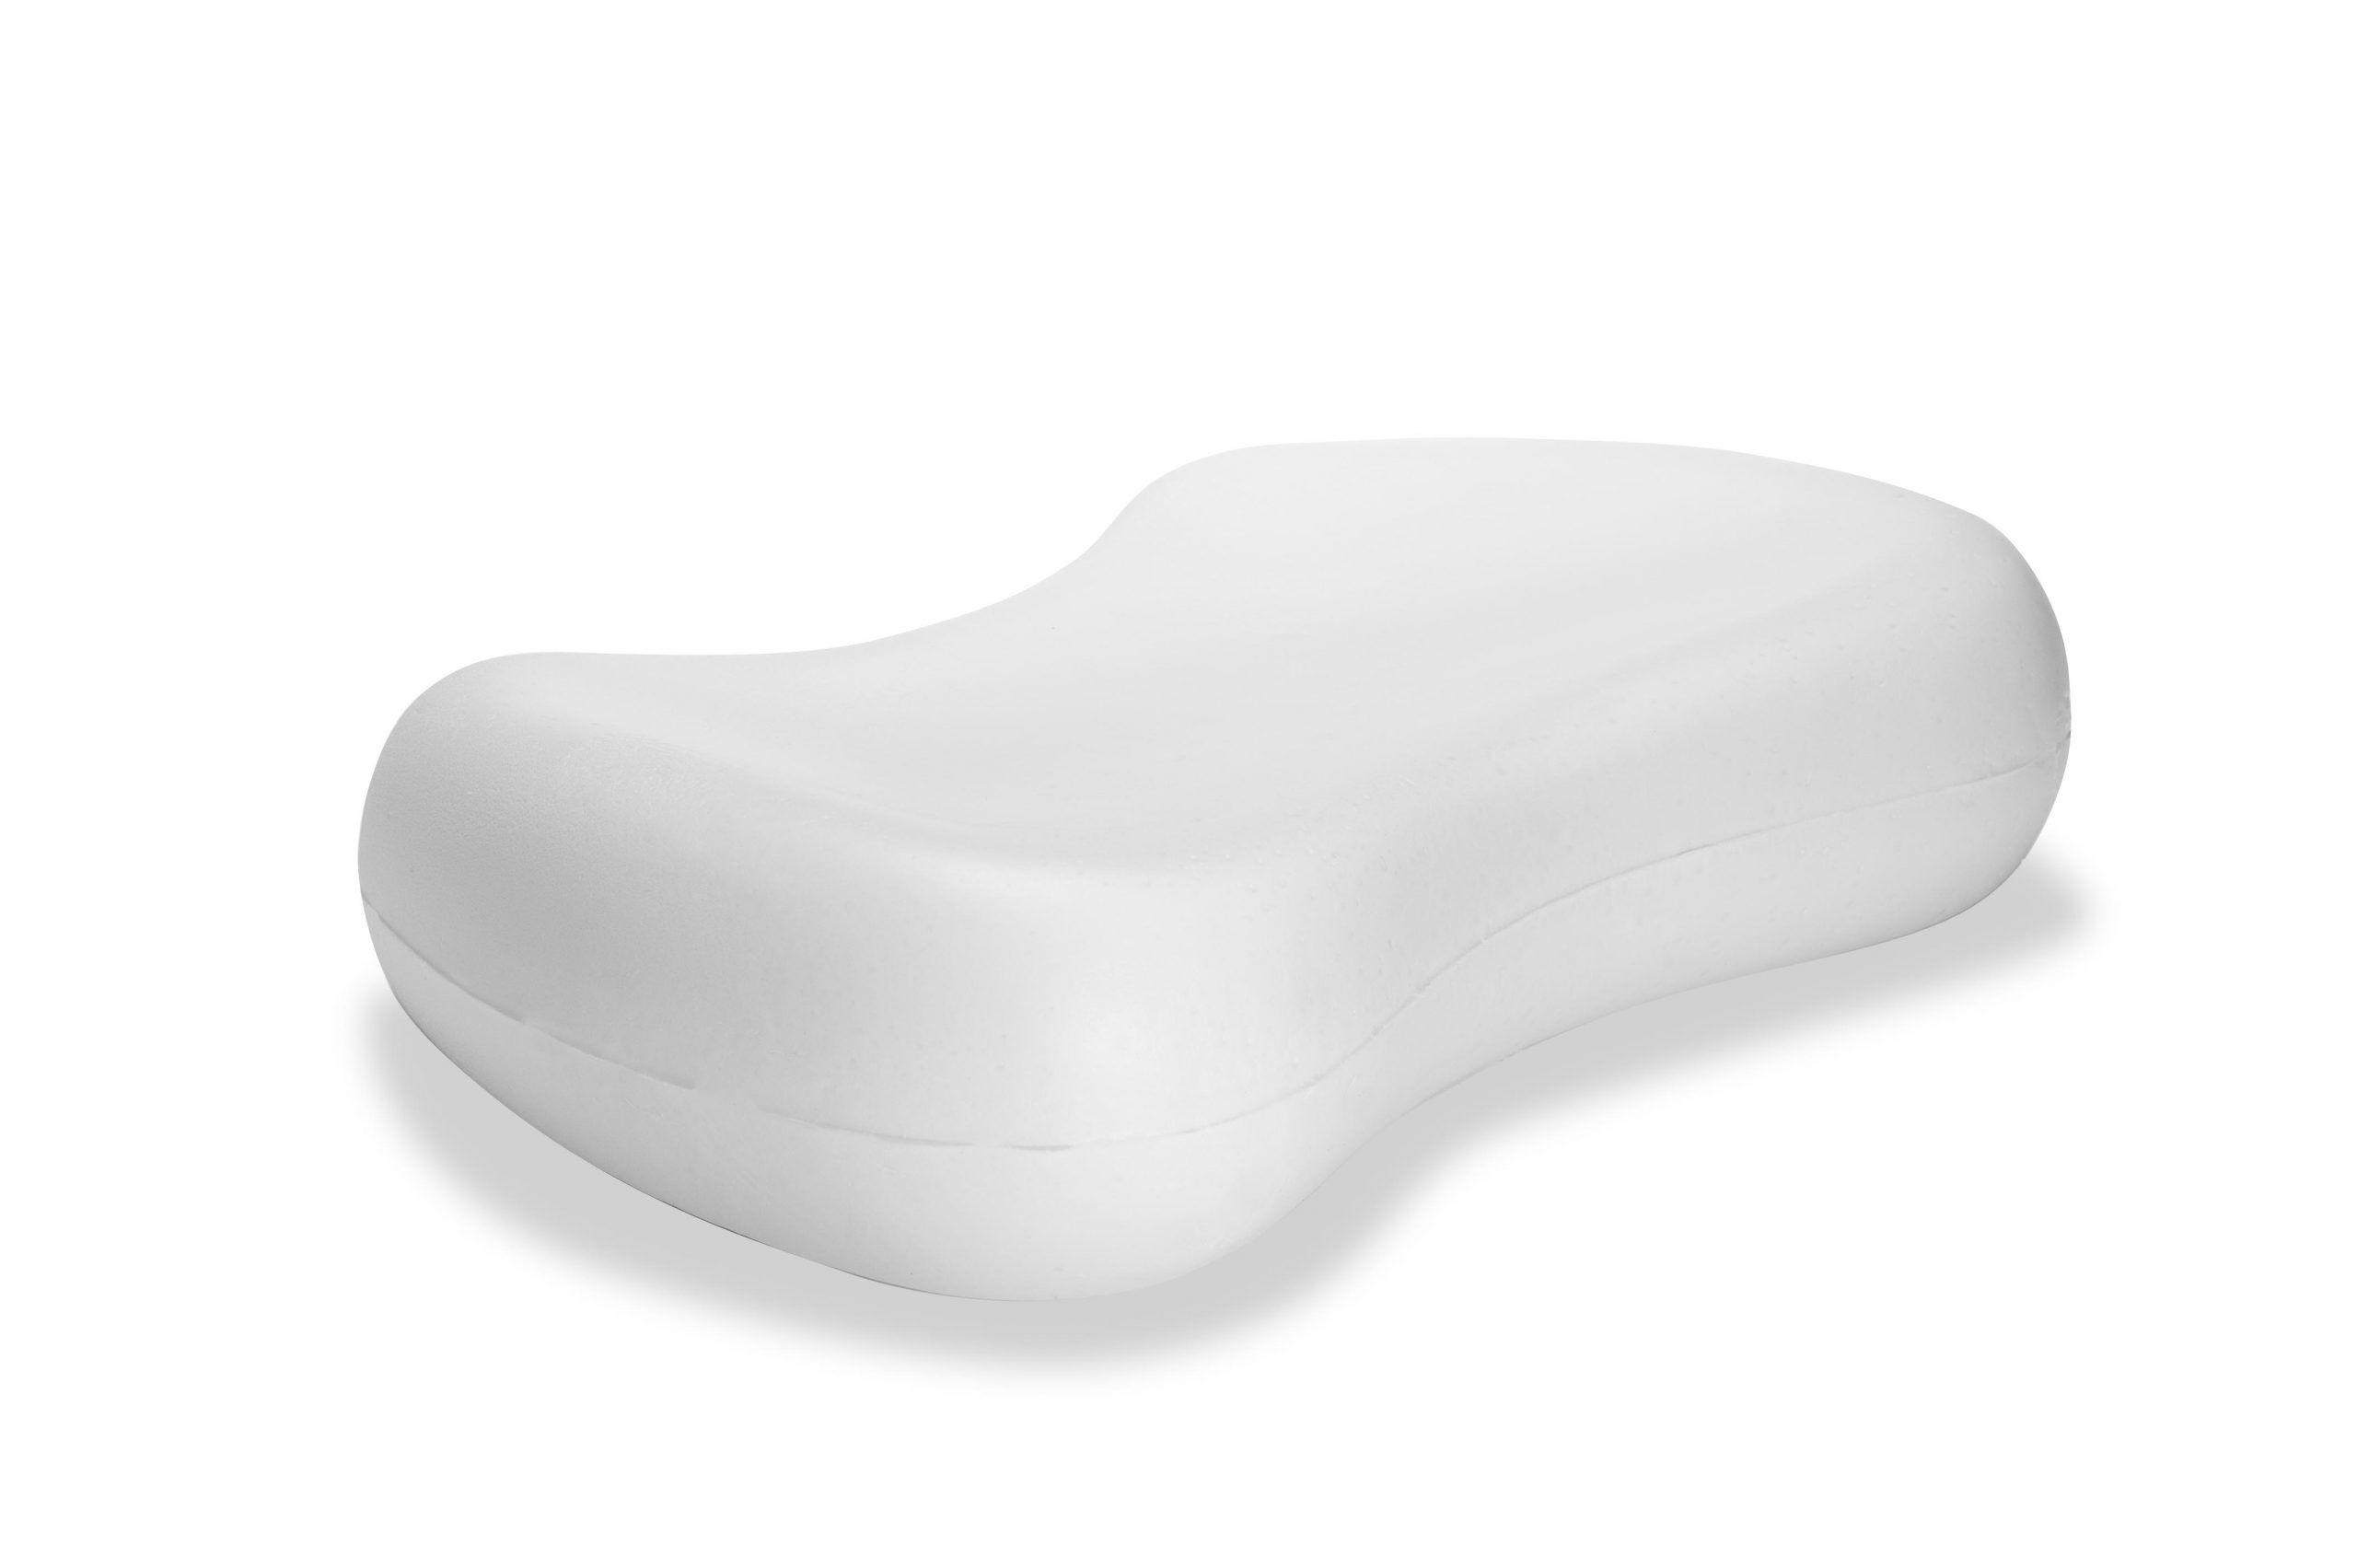 Dentons Impression Multi Profile Pillow